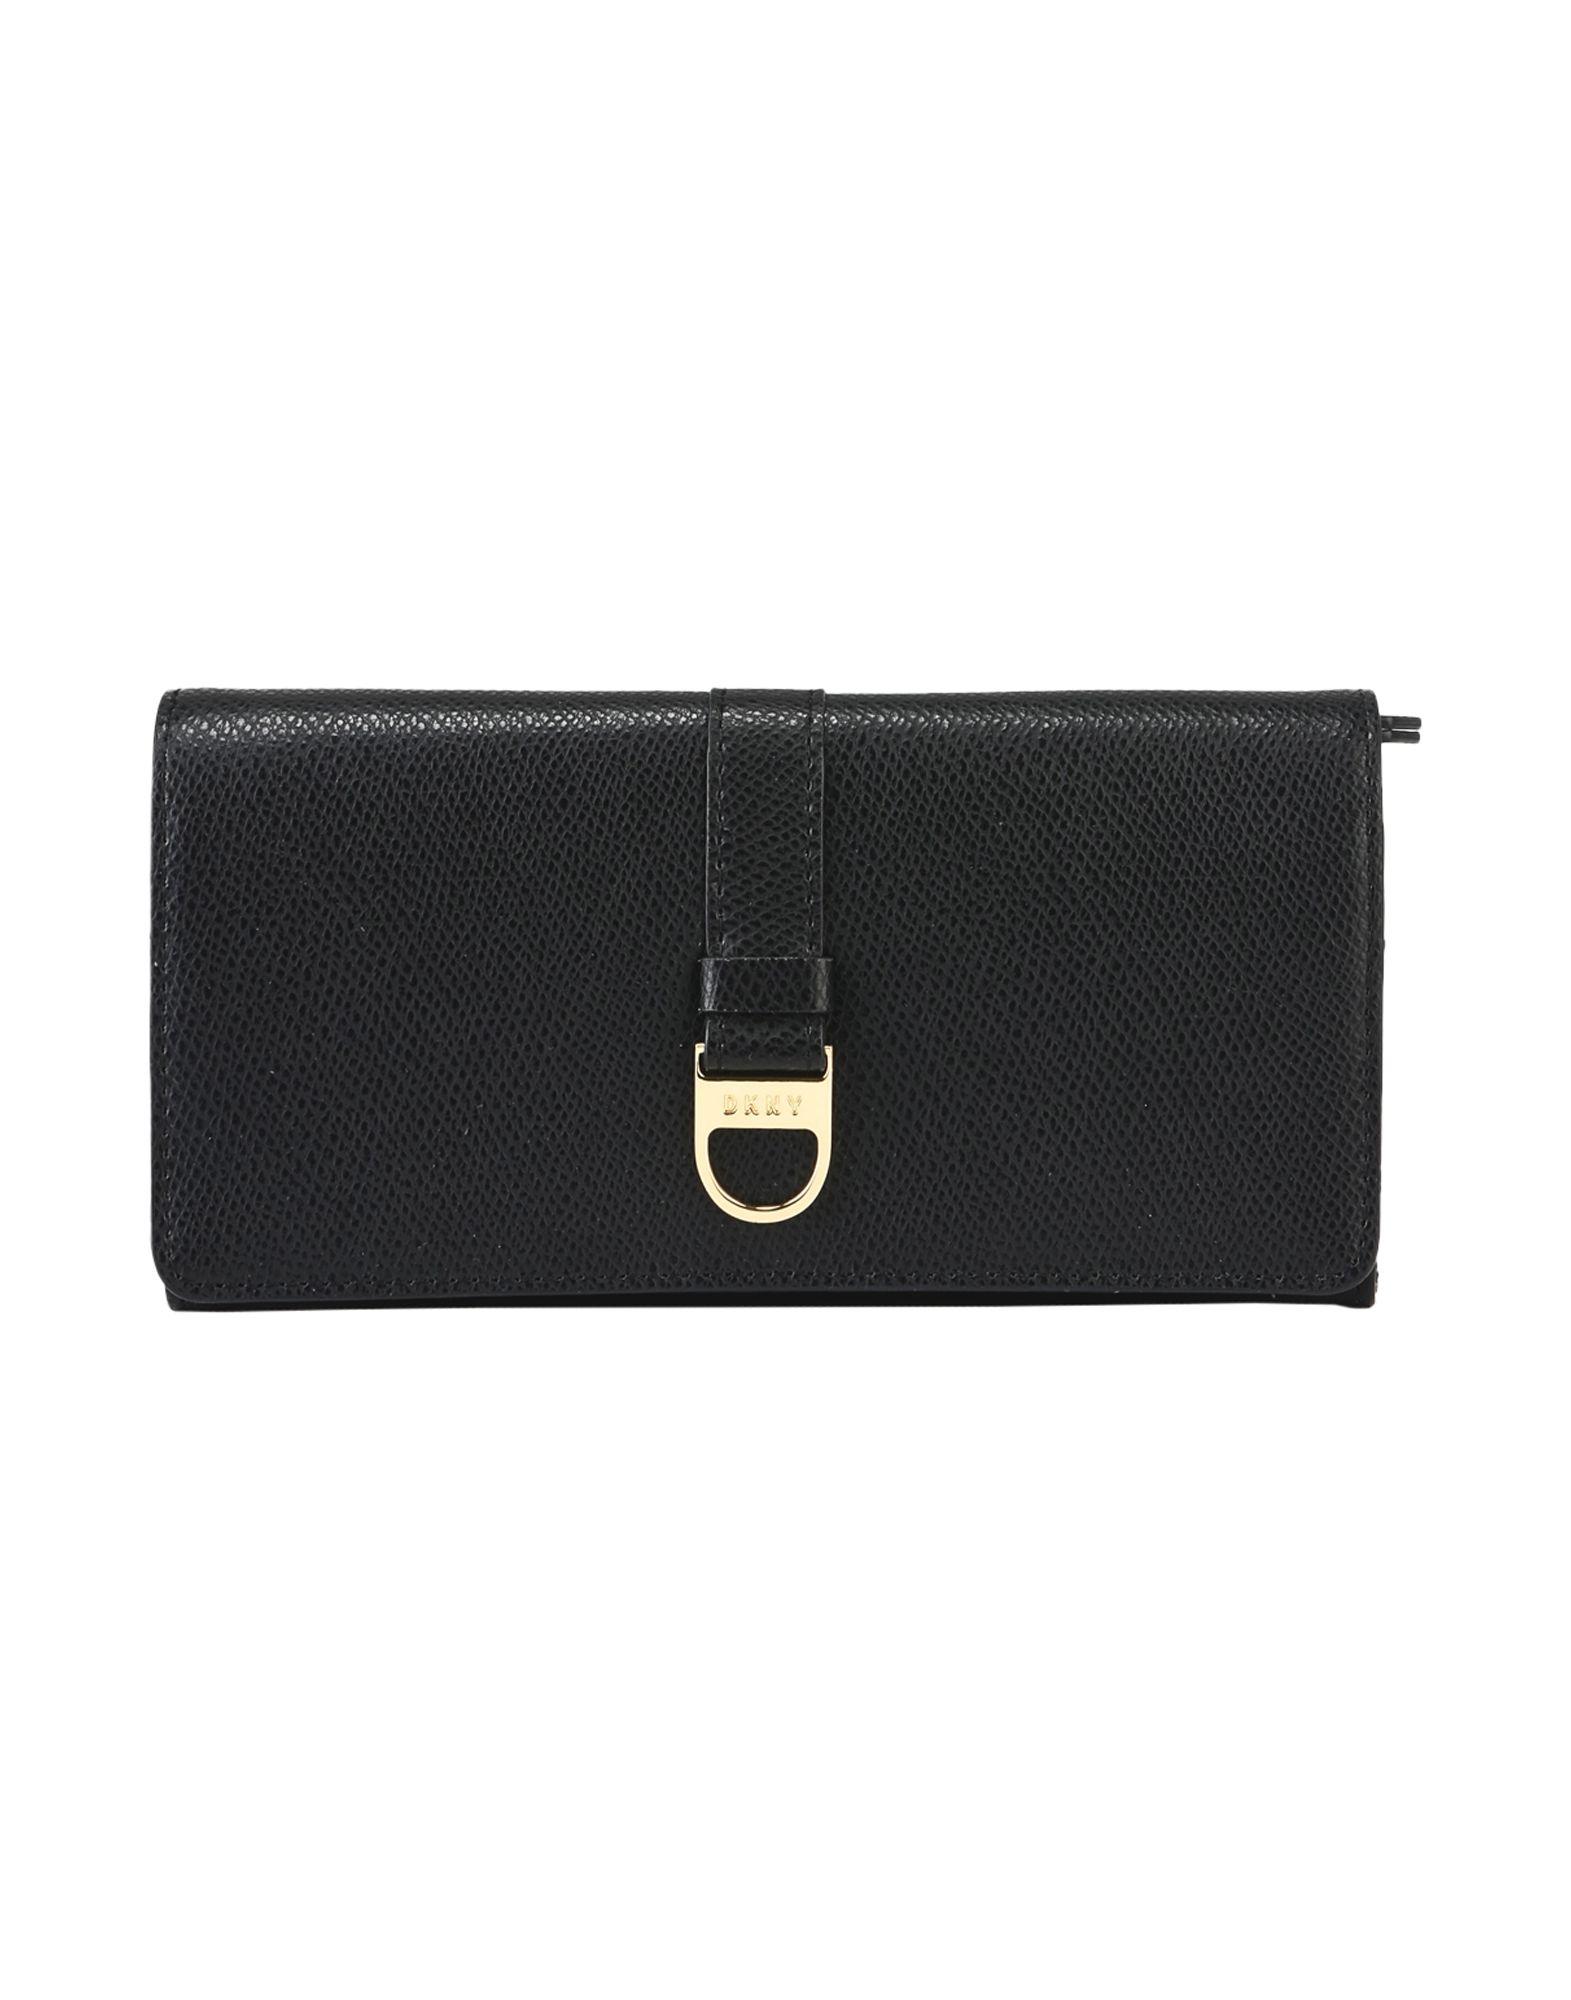 DKNY レディース 財布 ブラック 牛革 100%